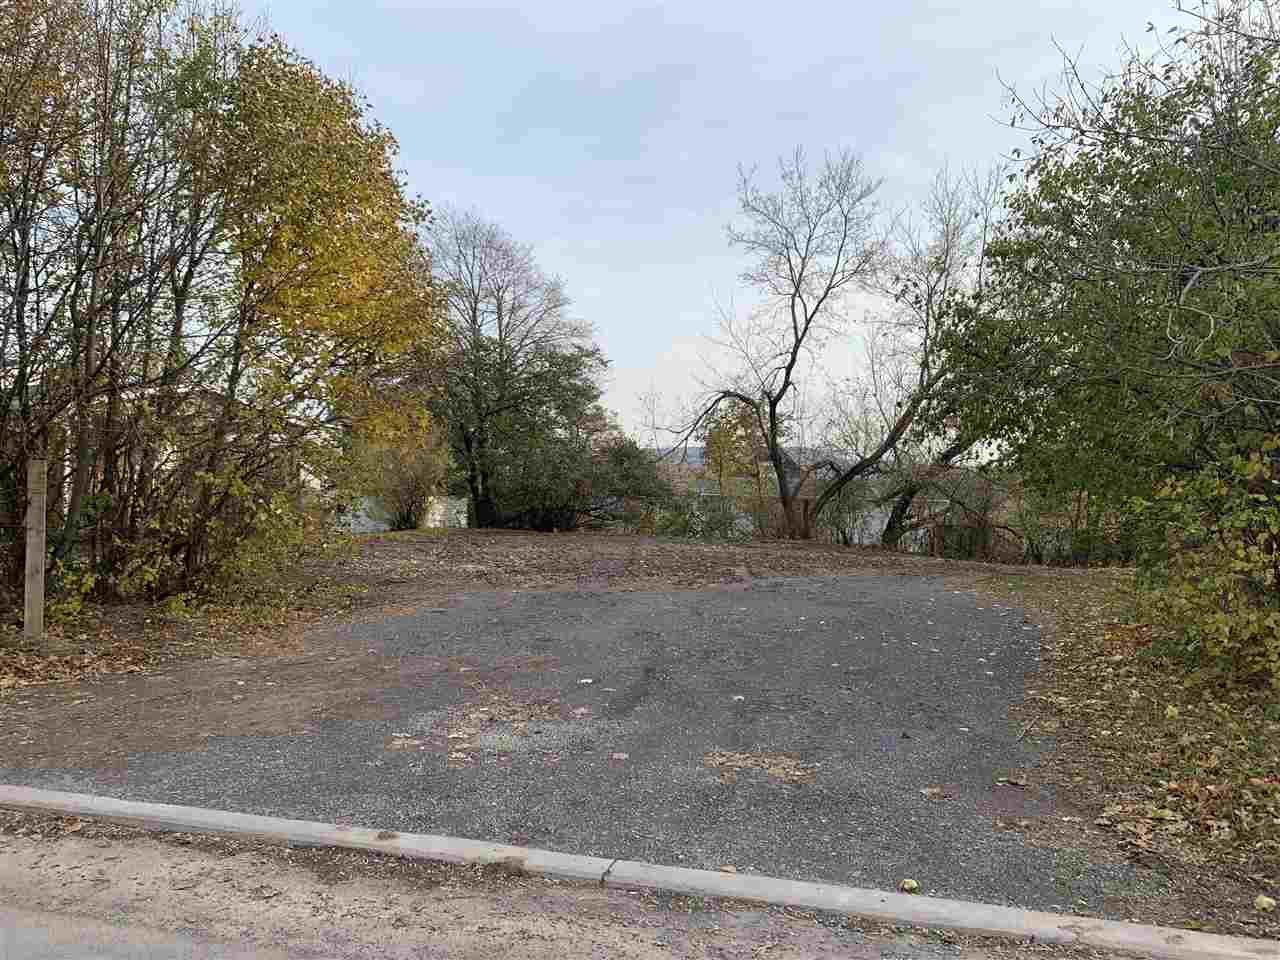 Main Photo: 31 St. Bernard Street in Stellarton: 106-New Glasgow, Stellarton Vacant Land for sale (Northern Region)  : MLS®# 202023374